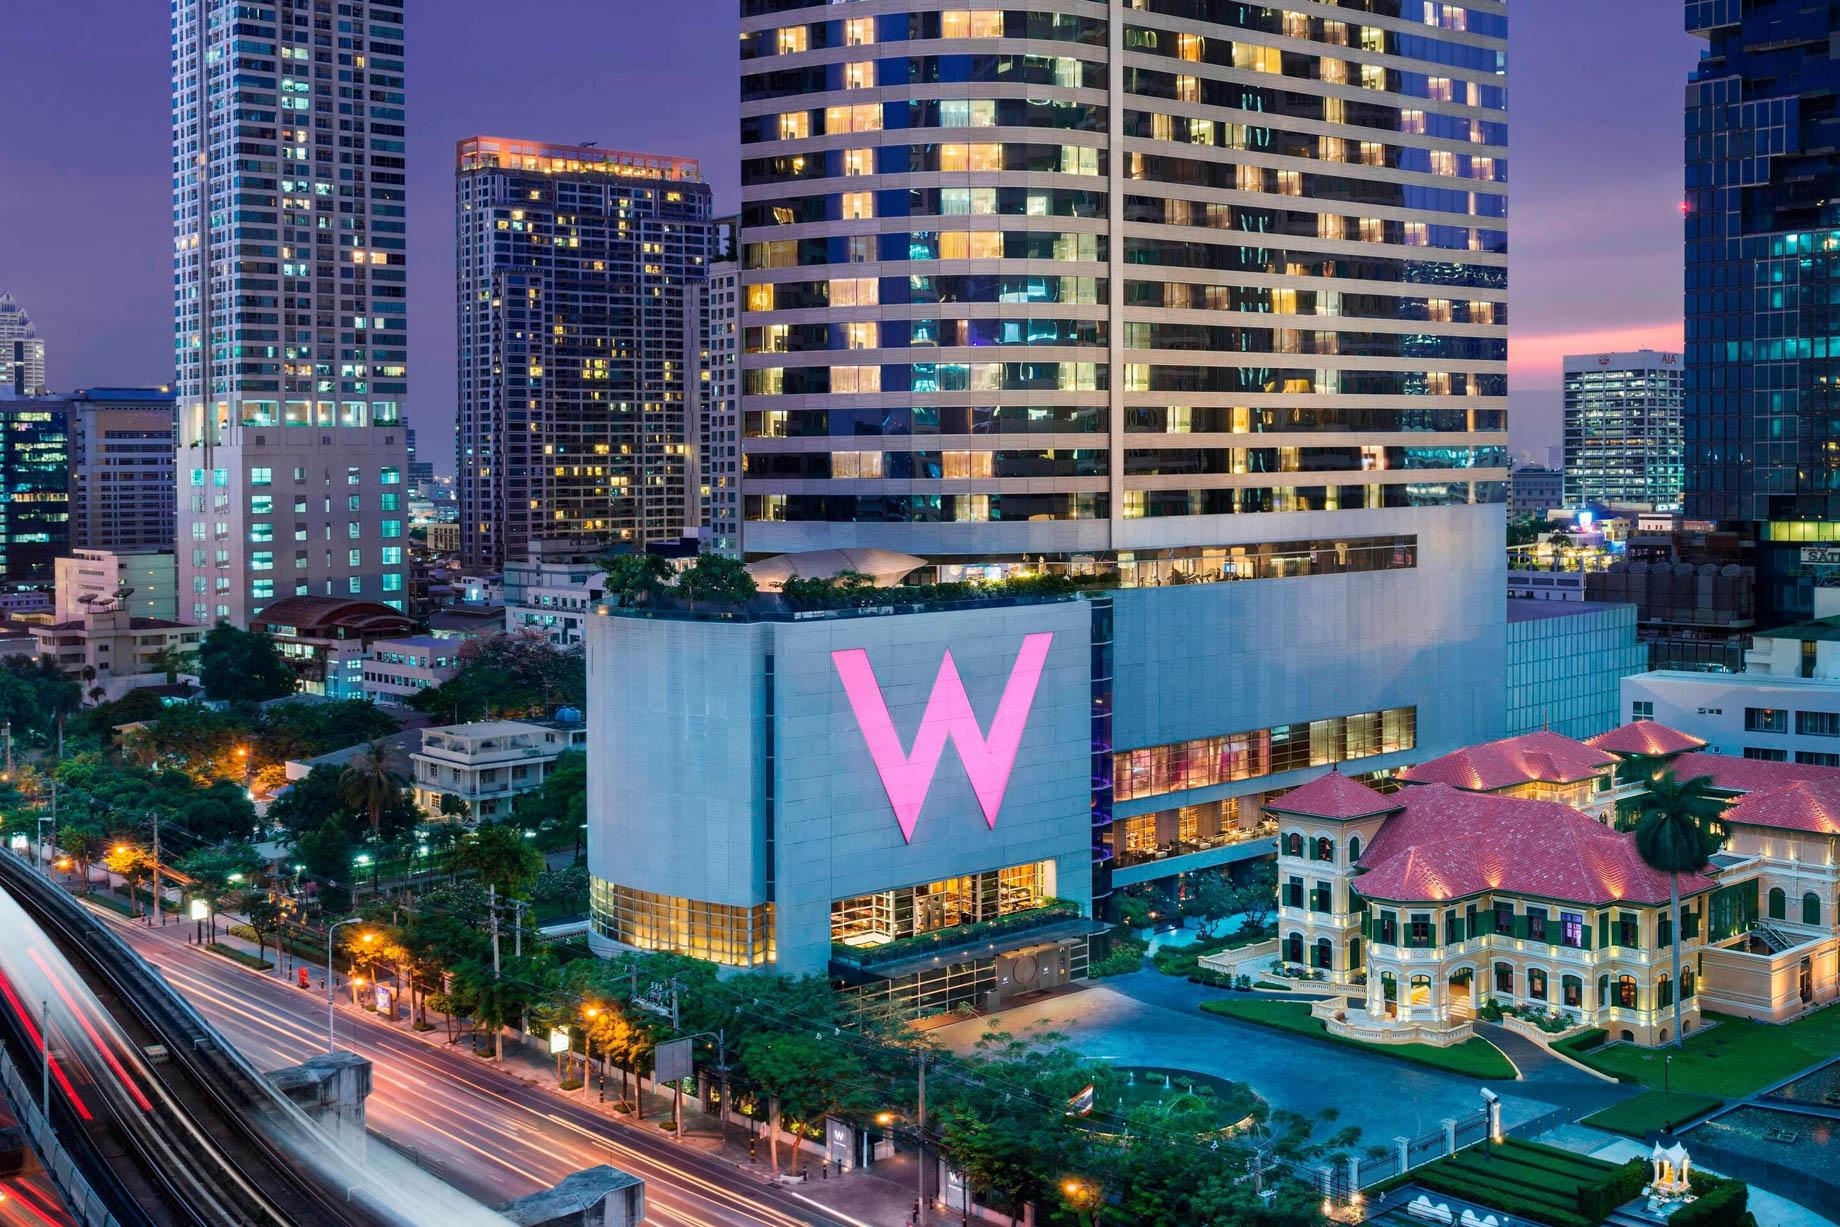 W Bangkok Luxury Hotel - Bangkok, Thailand - Hotel Exterior Night